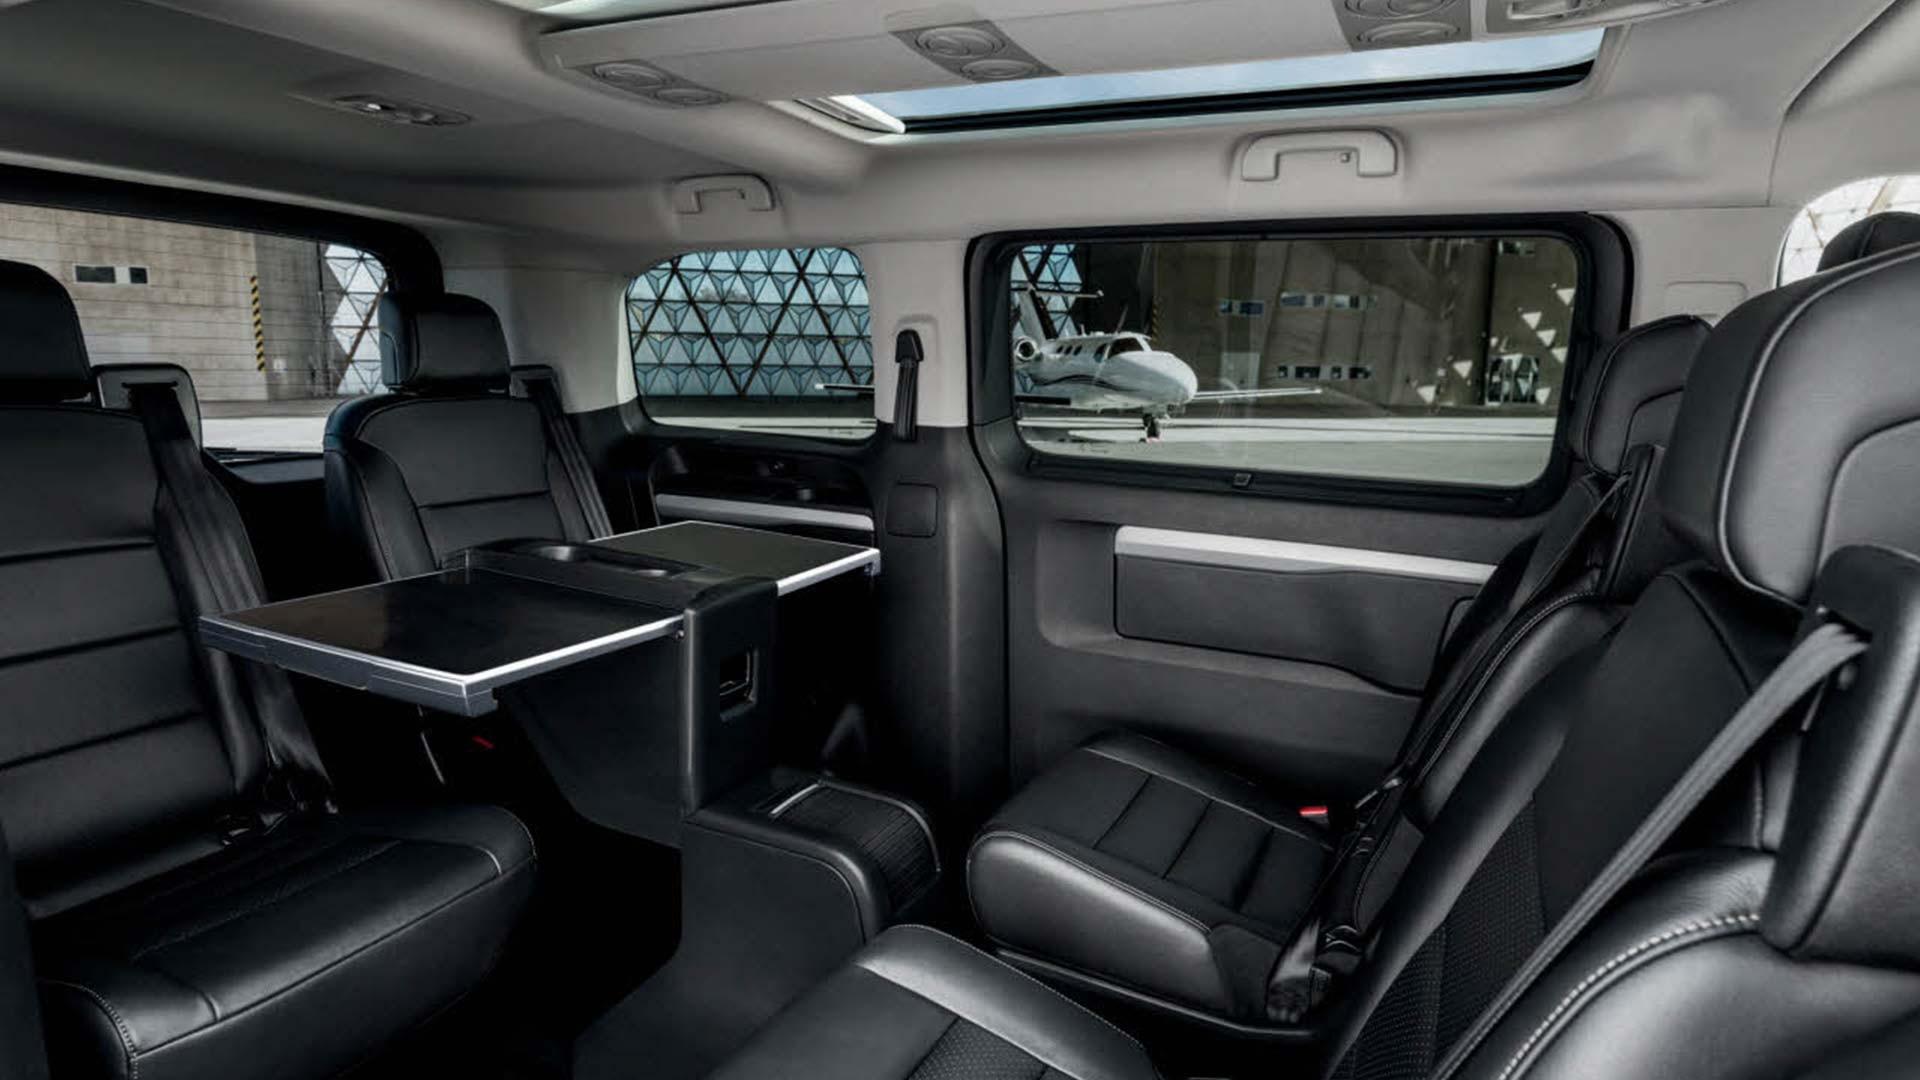 Peugeot >> Nuevo Peugeot Traveller Business: vehículo comercial